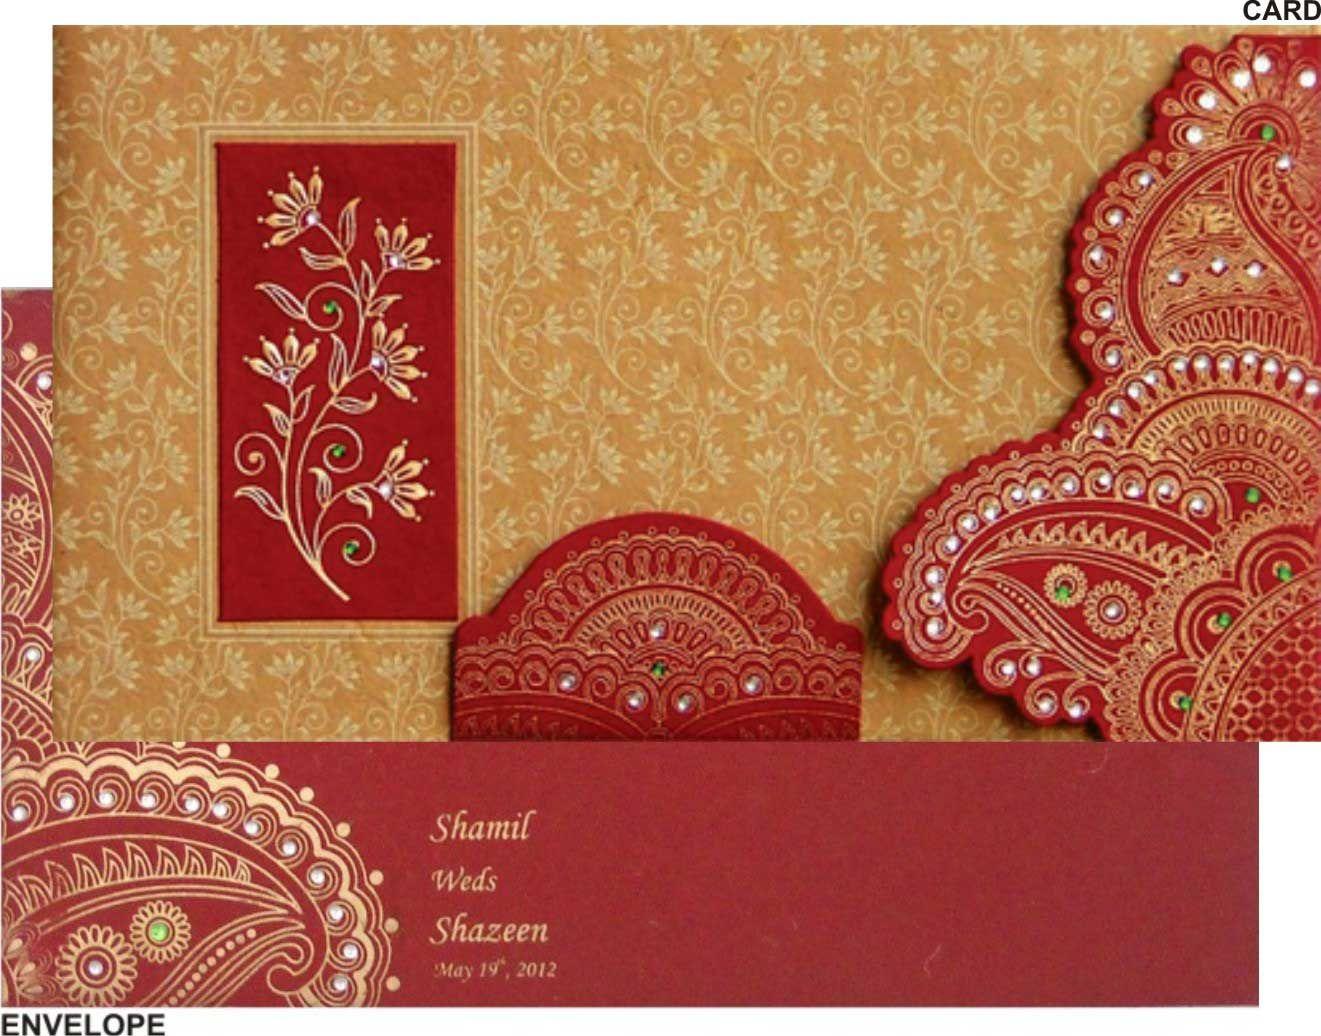 The Astonishing Indian Wedding Card Template Indian Weddin Indian Wedding Invitations Indian Wedding Invitation Cards Indian Wedding Invitation Card Design